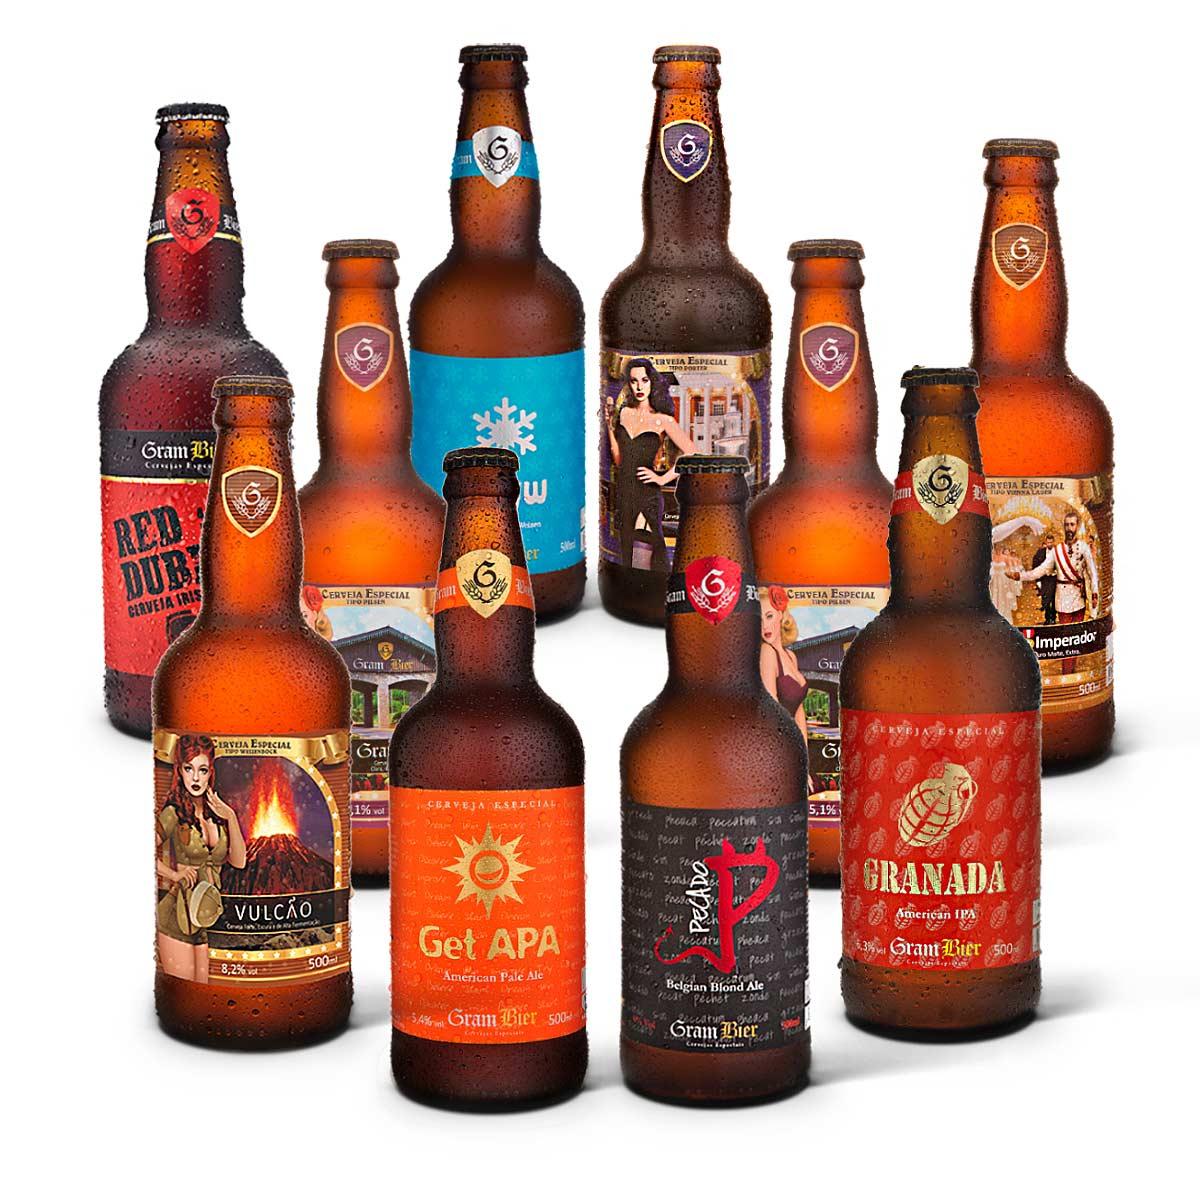 Kit degustação Gram Bier 10 cervejas 500ml